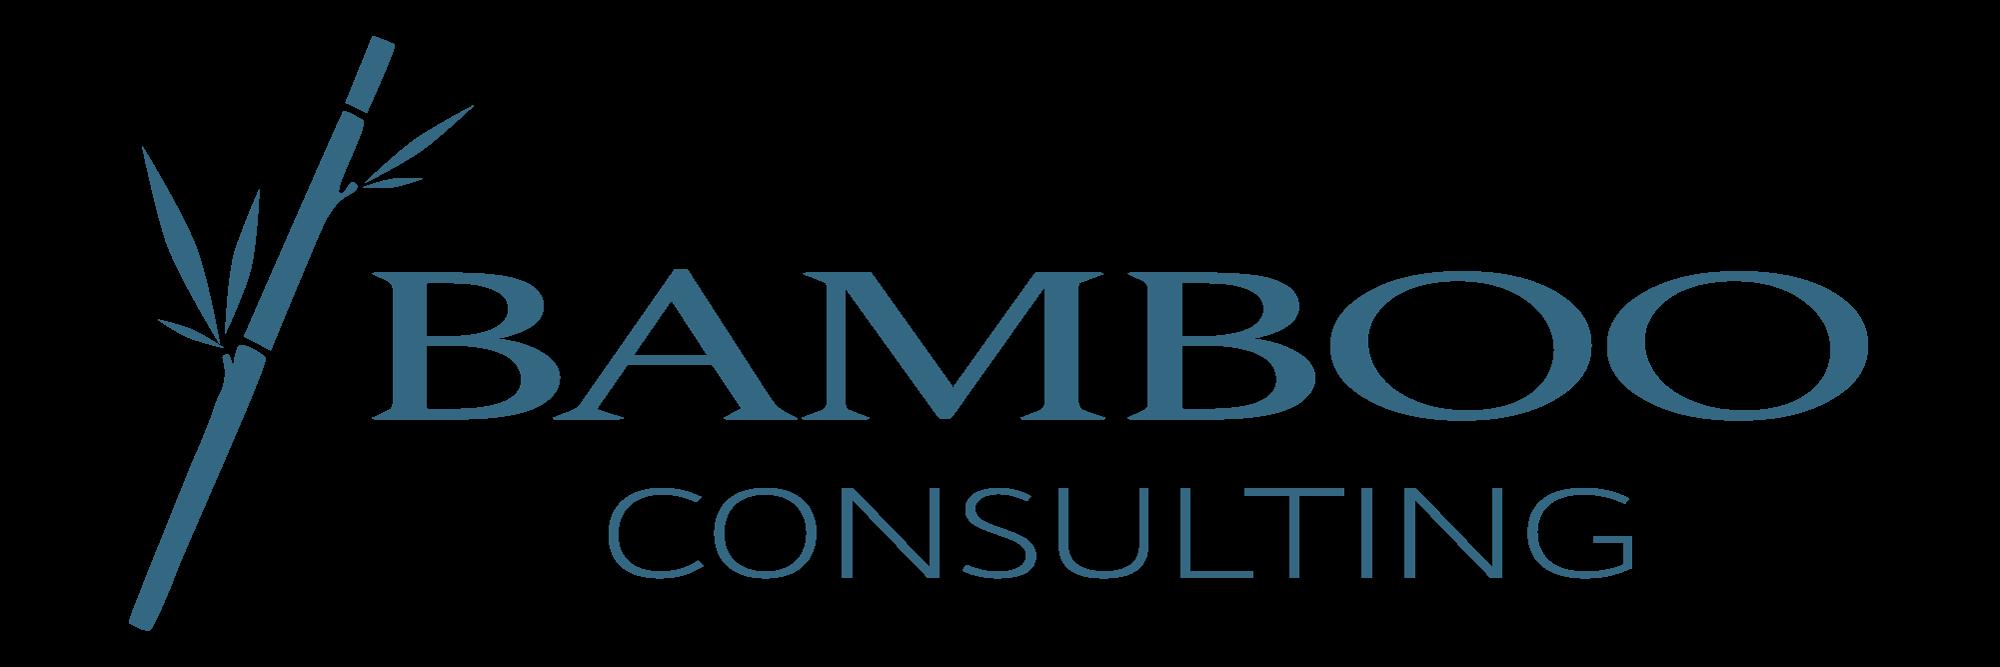 Bamboo Consulting logo